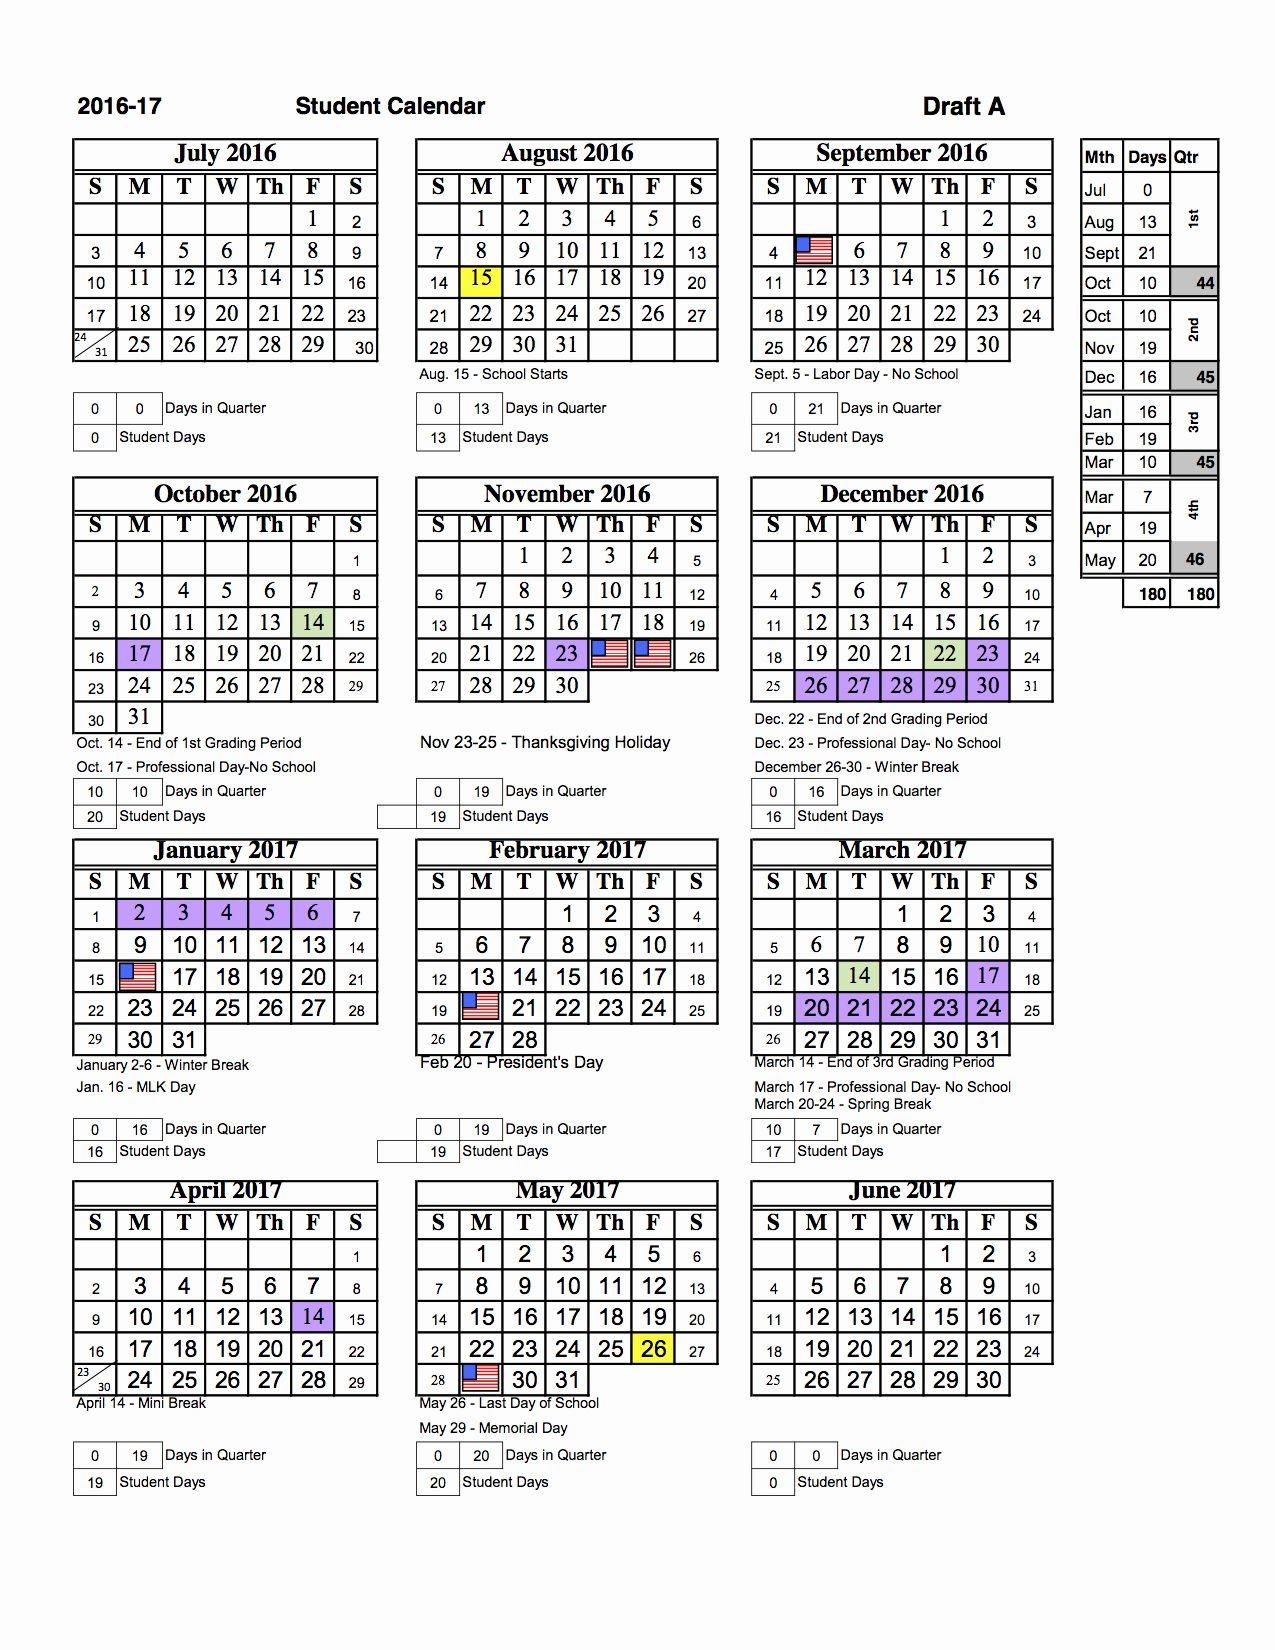 Fresh 46 Examples Sarasota County School Calndar019 2020 Throughout Public School Spring Vacation Dates San Diego County